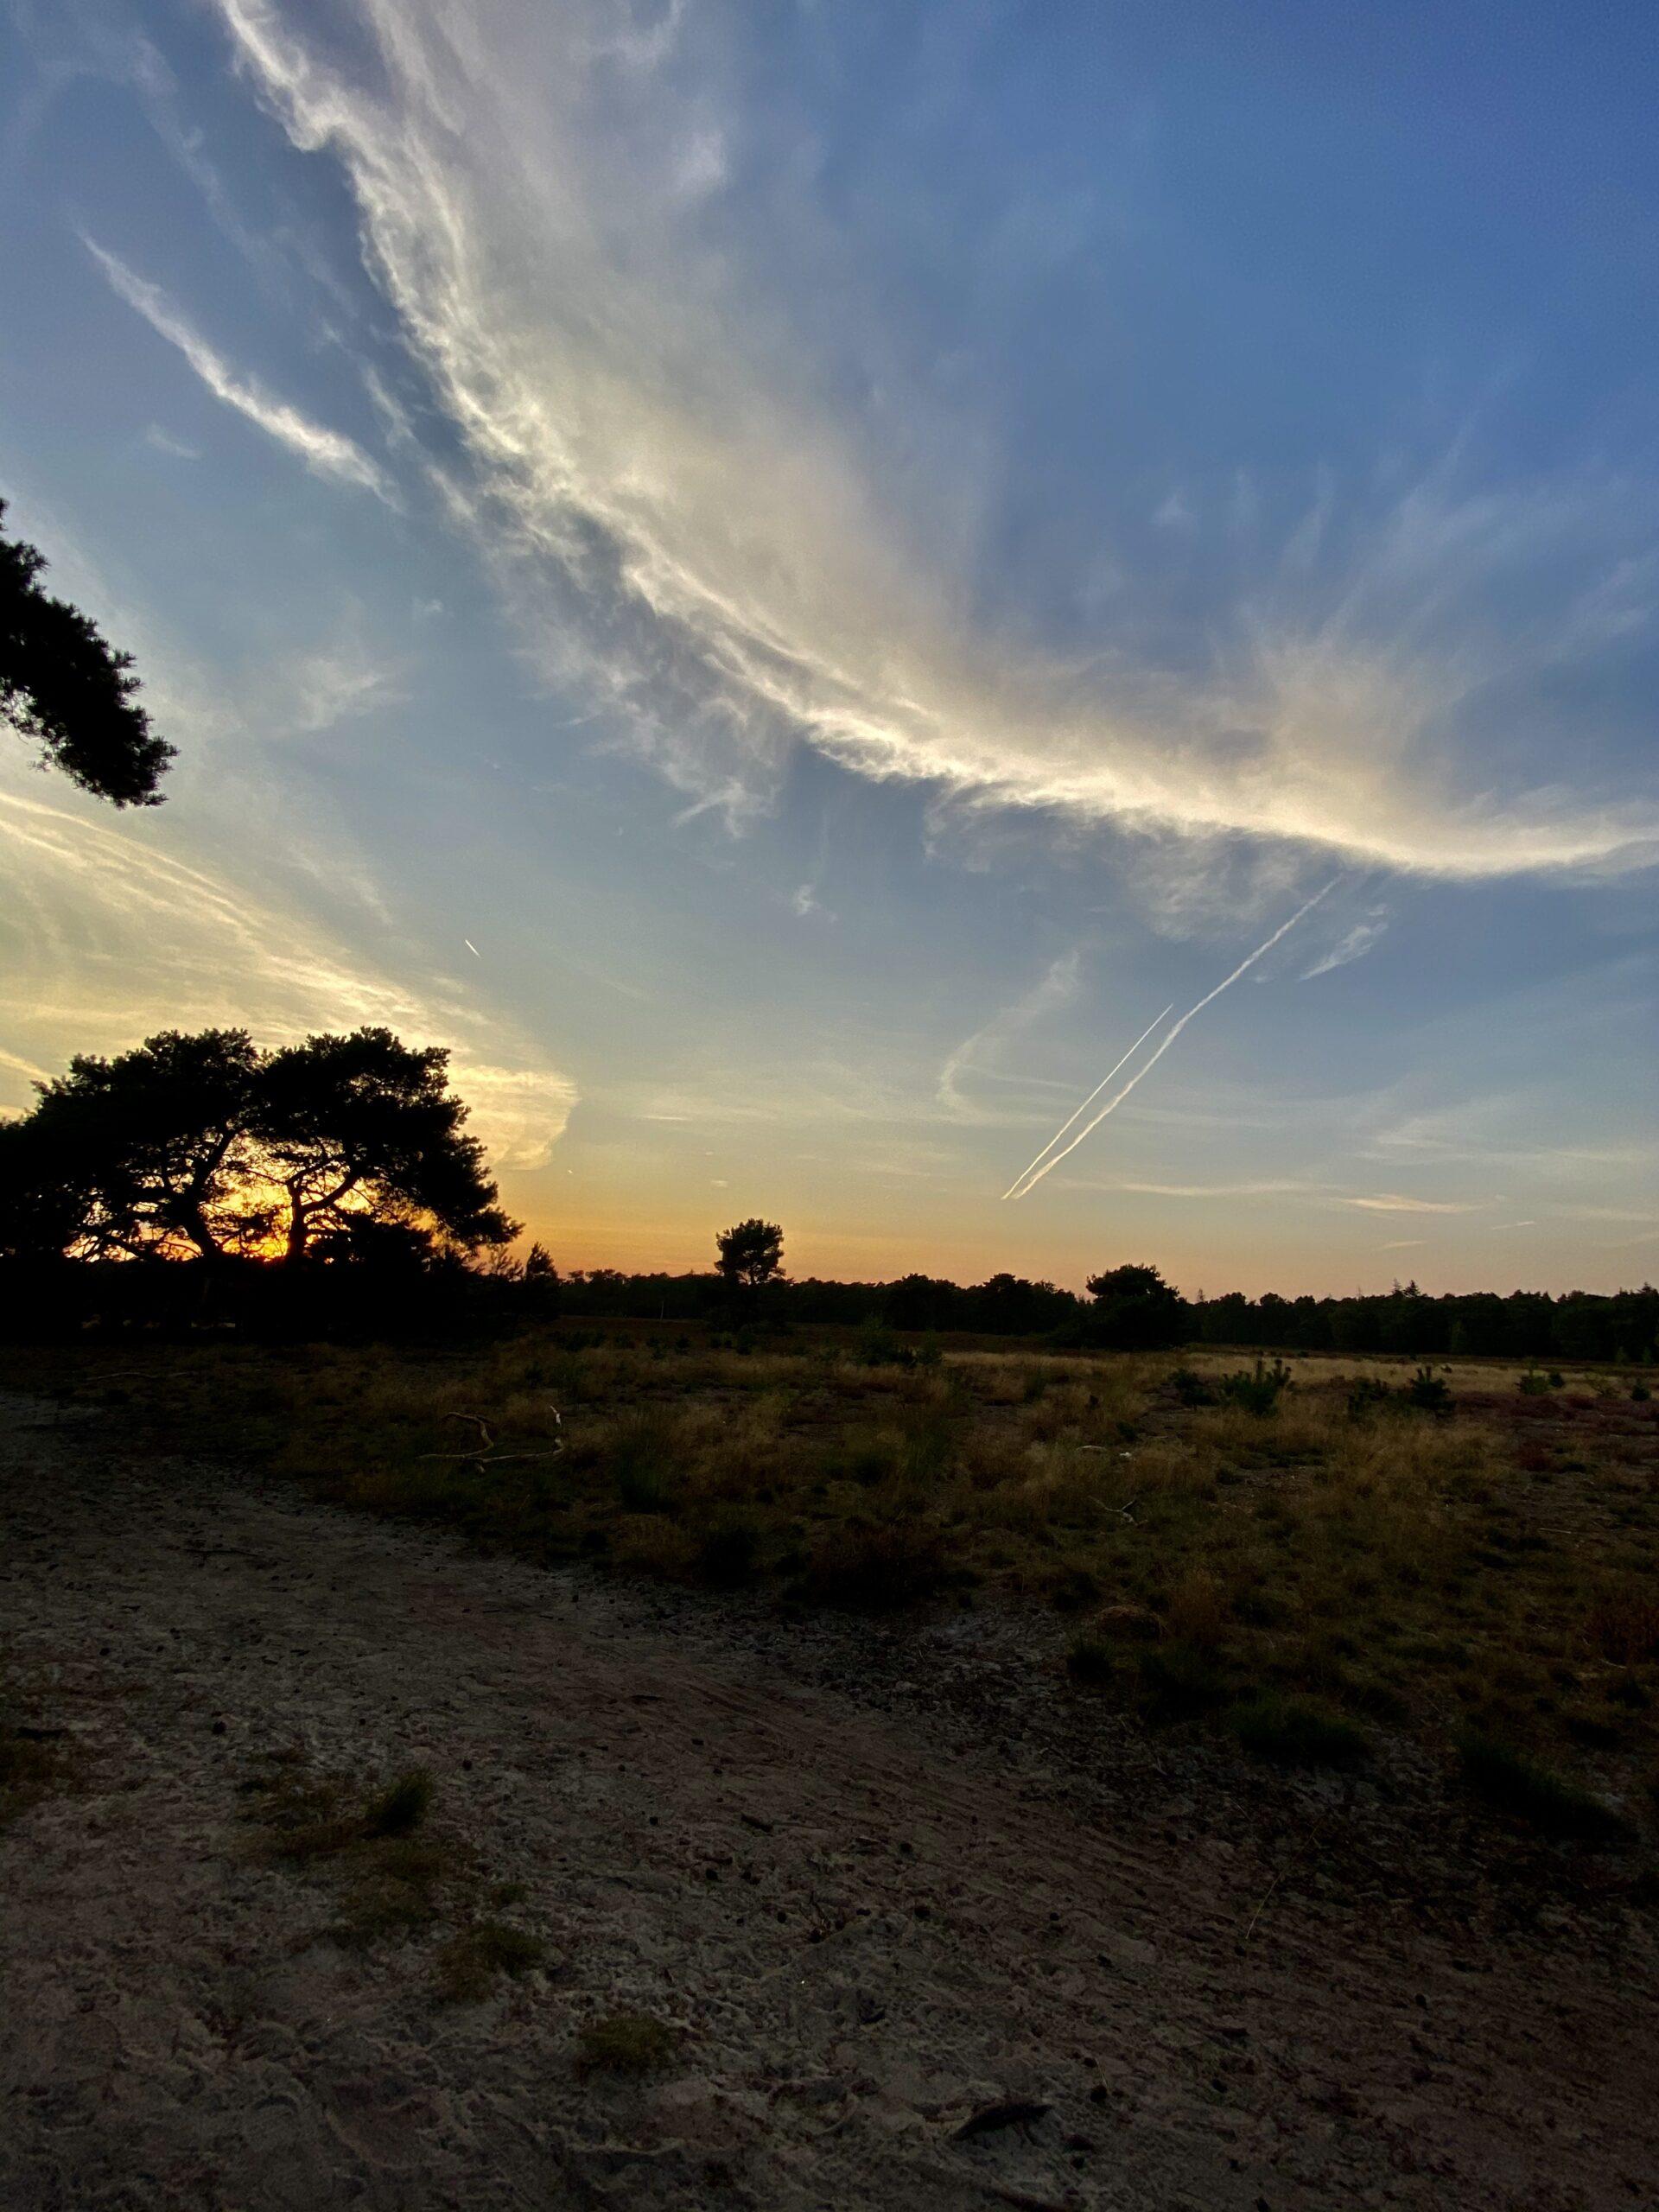 Witven – Stiphout – Helmond